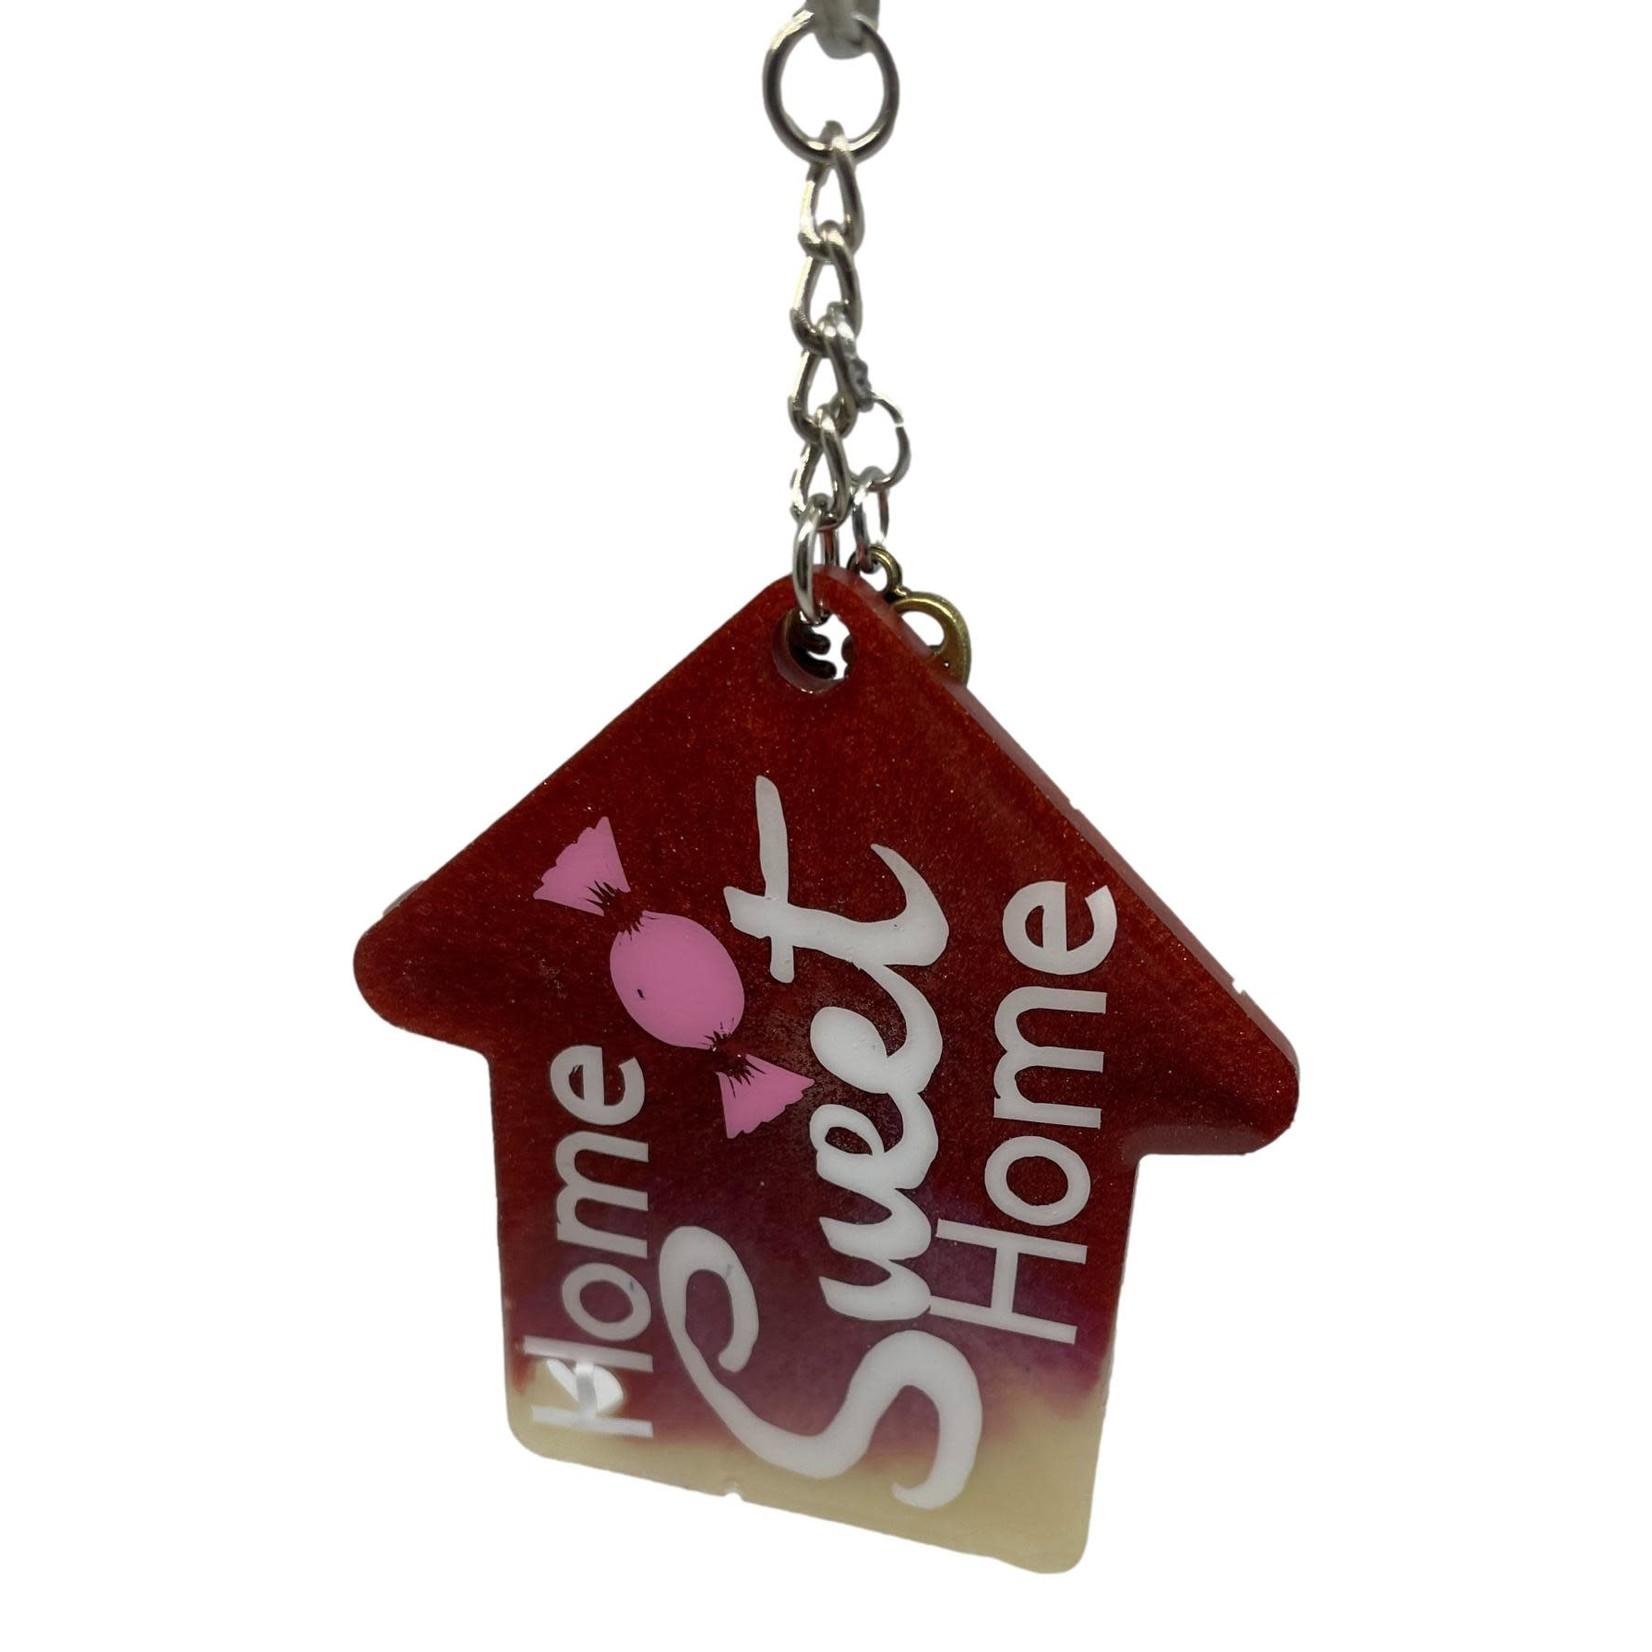 East Coast Sirens Home Sweet Home House Key Chain